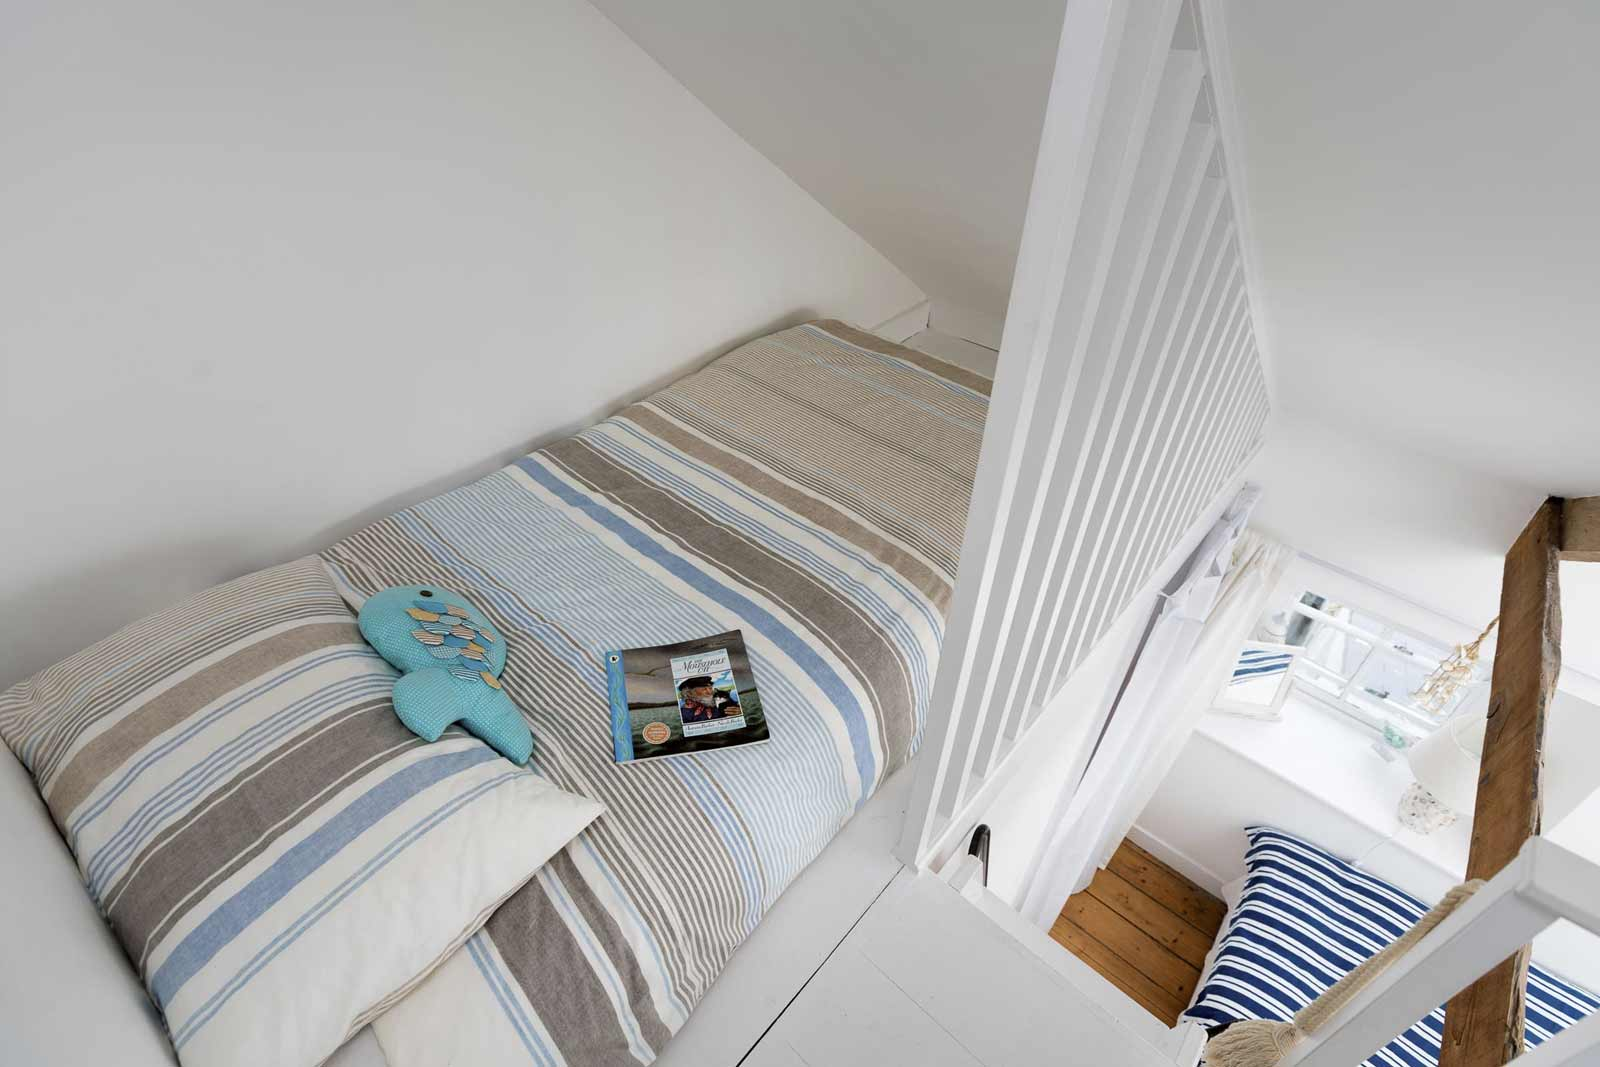 gulls-nest-pirates-quarters-3rd-bed